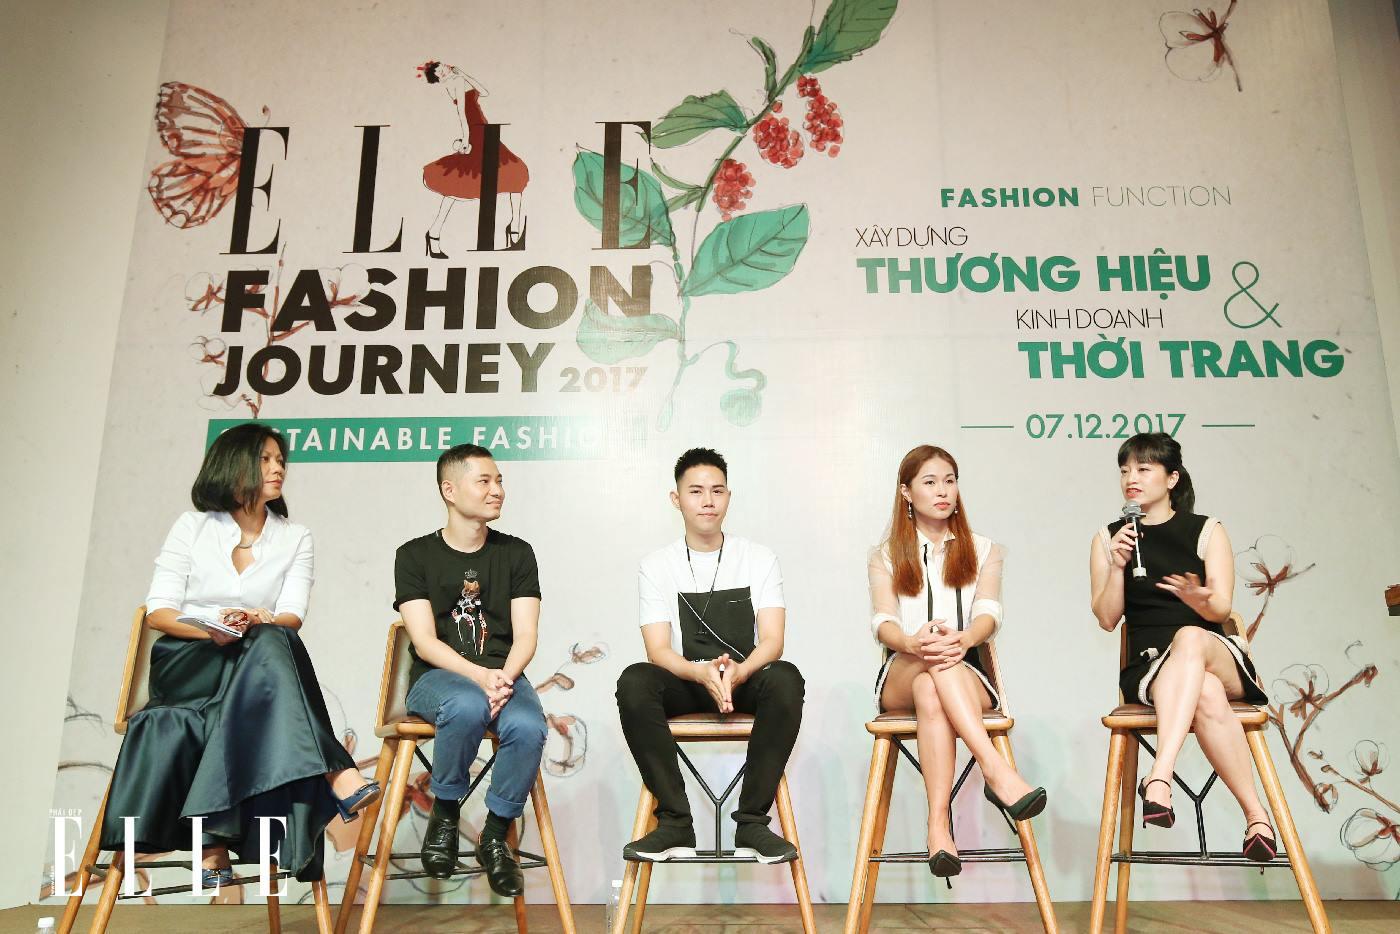 kinh doanh thời trang 2017